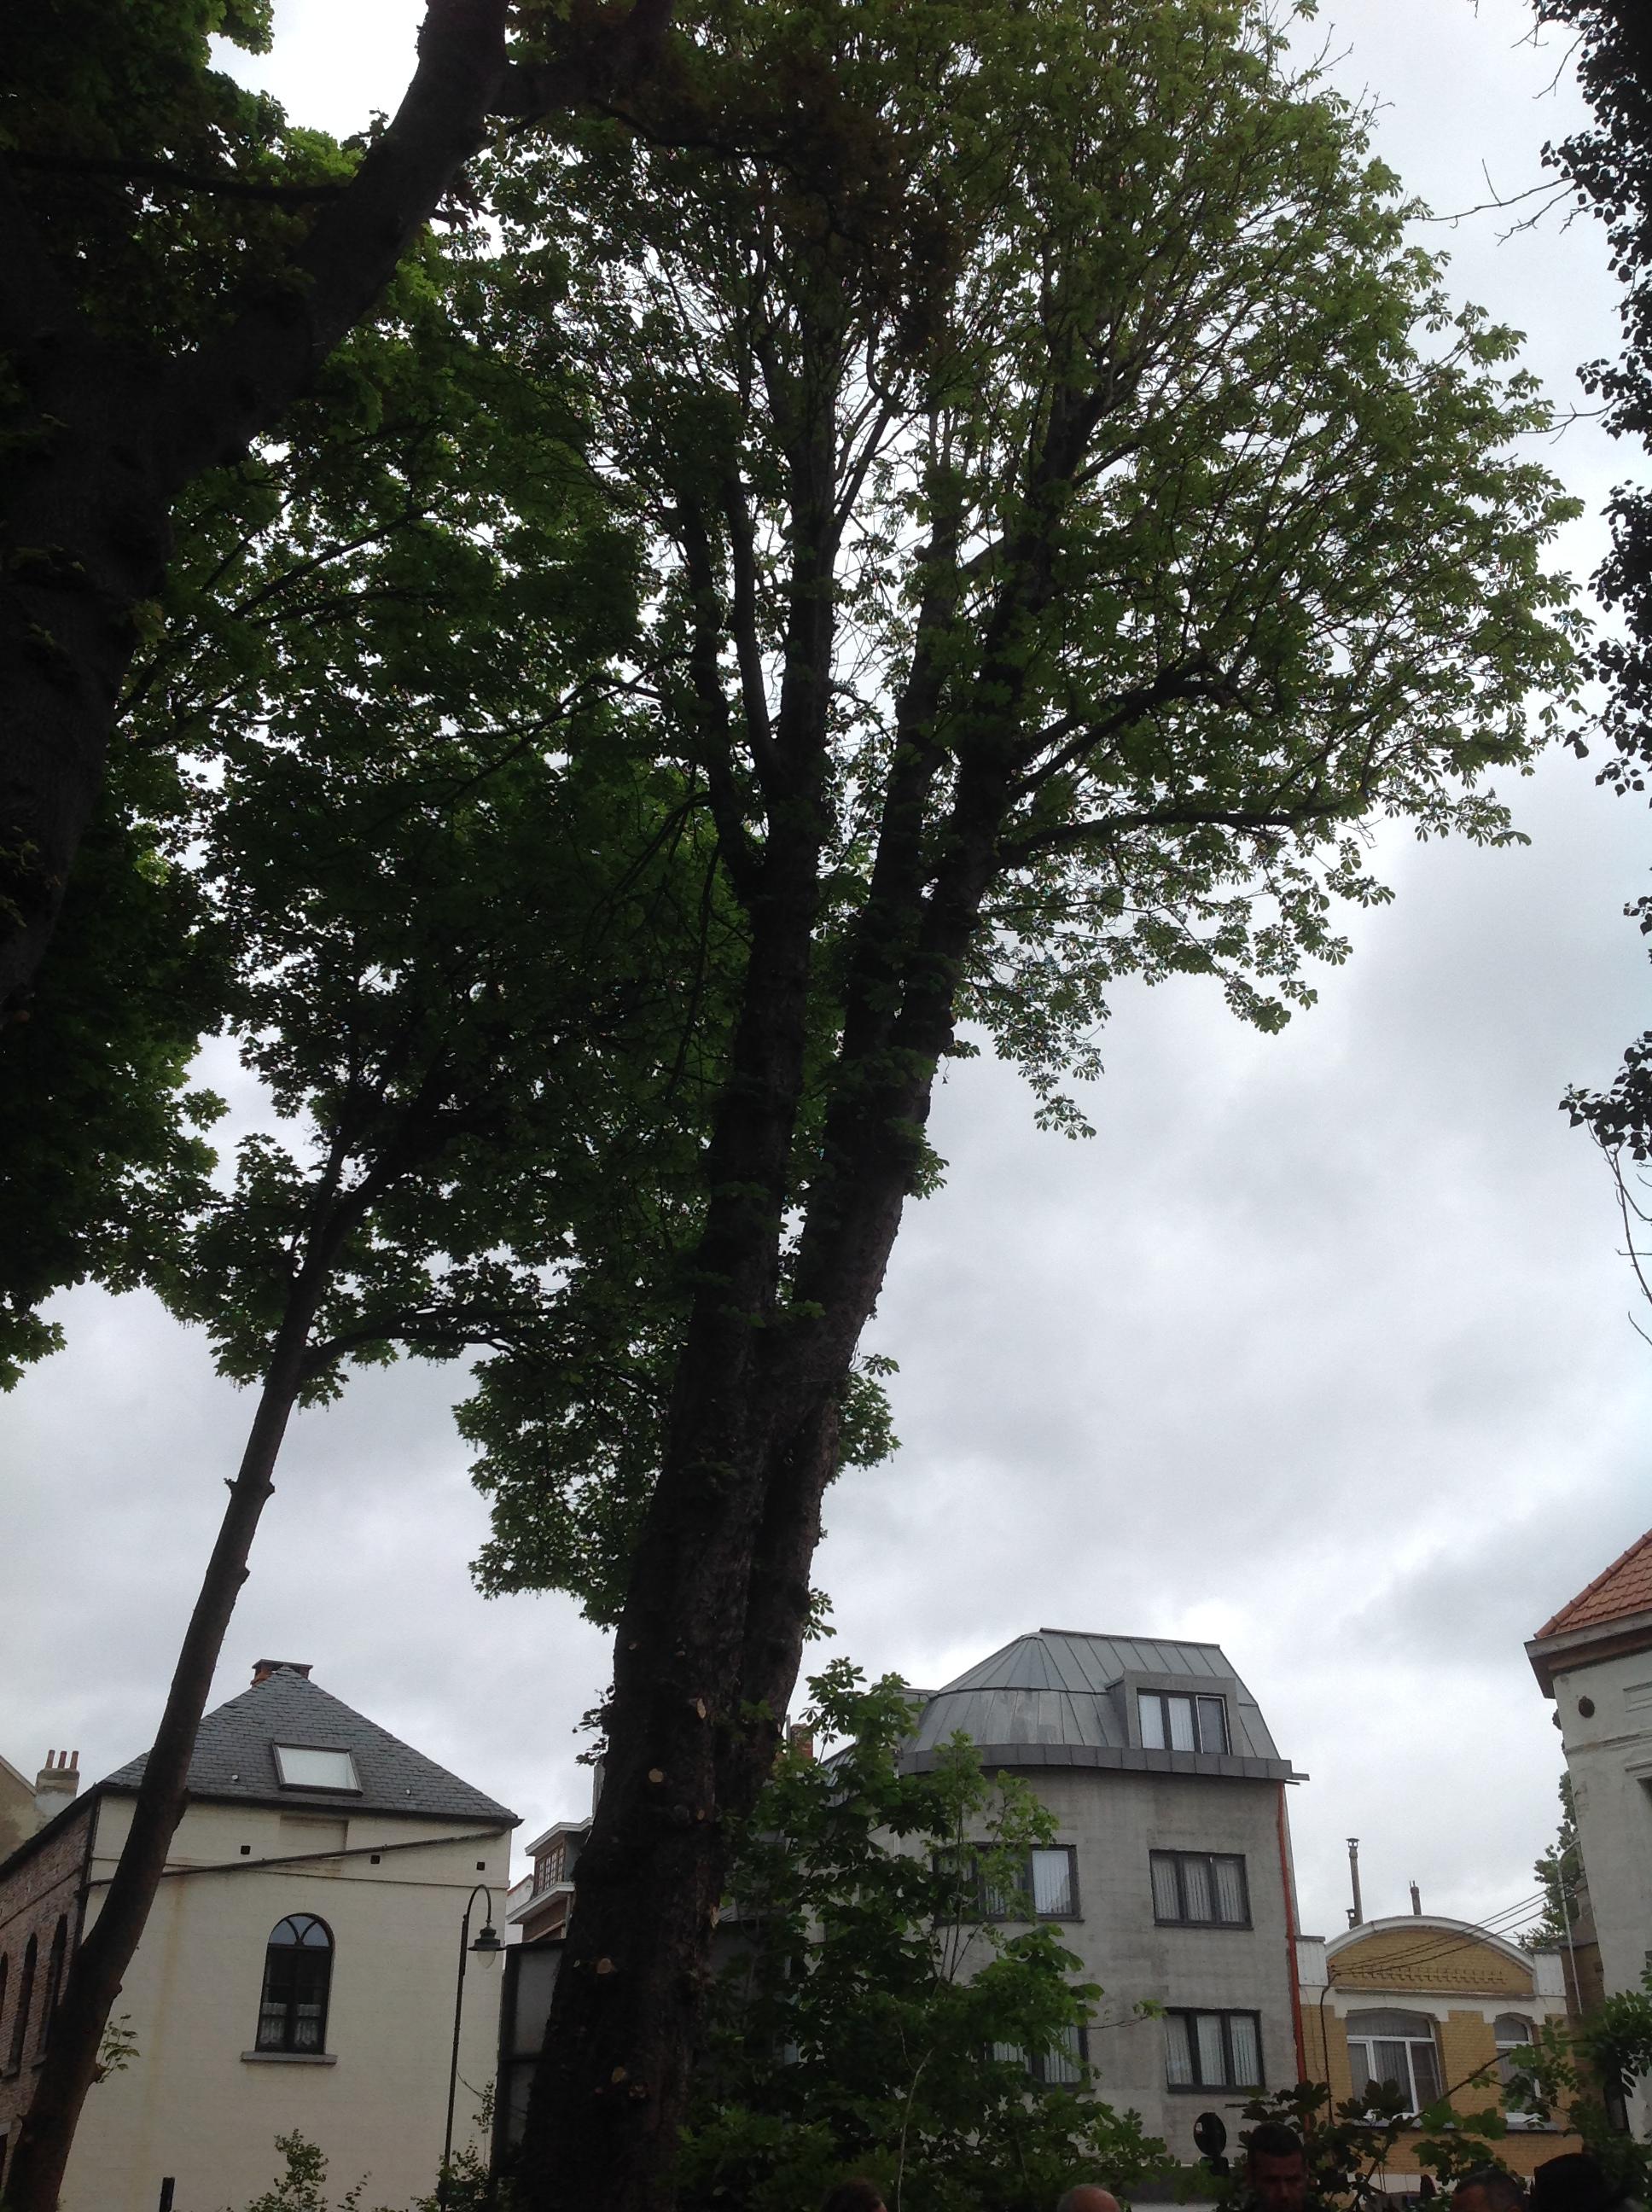 Marronnier commun – Bruxelles, Square Prince Charles –  08 Mai 2014